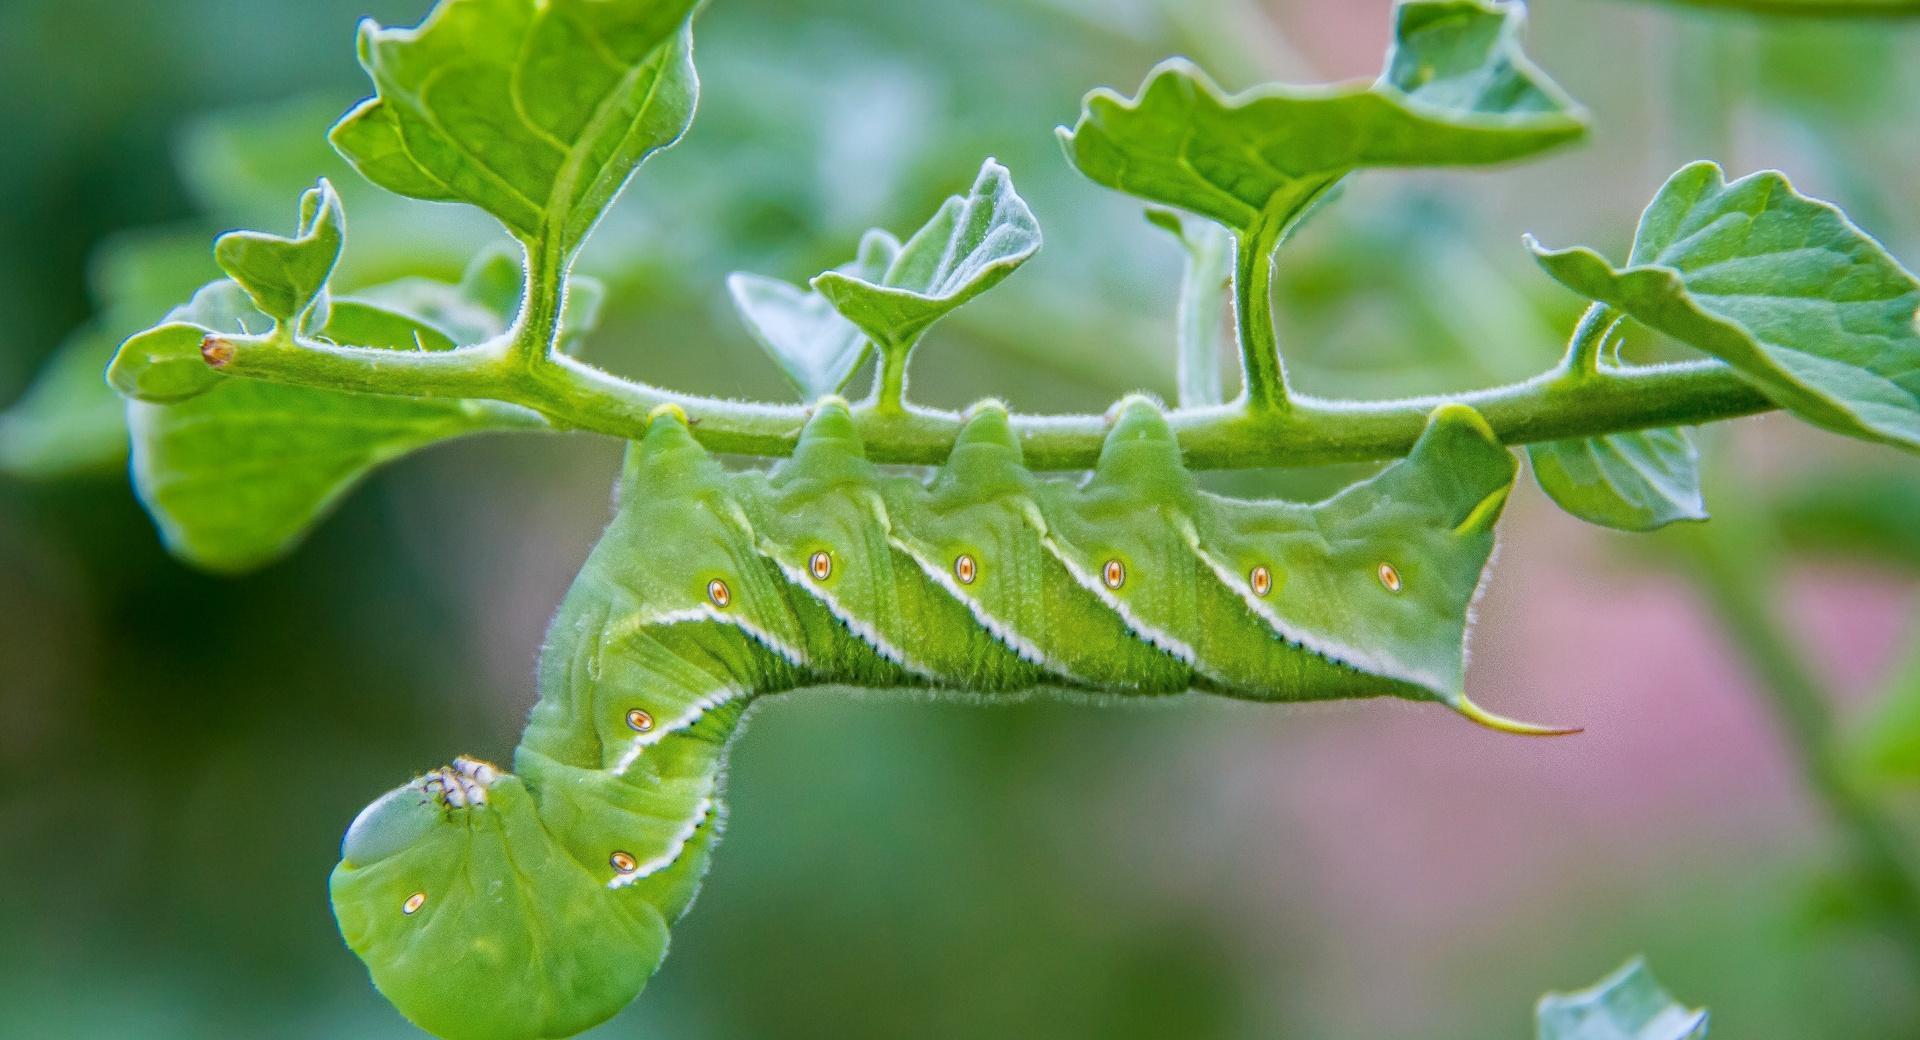 Green Caterpillar wallpapers HD quality